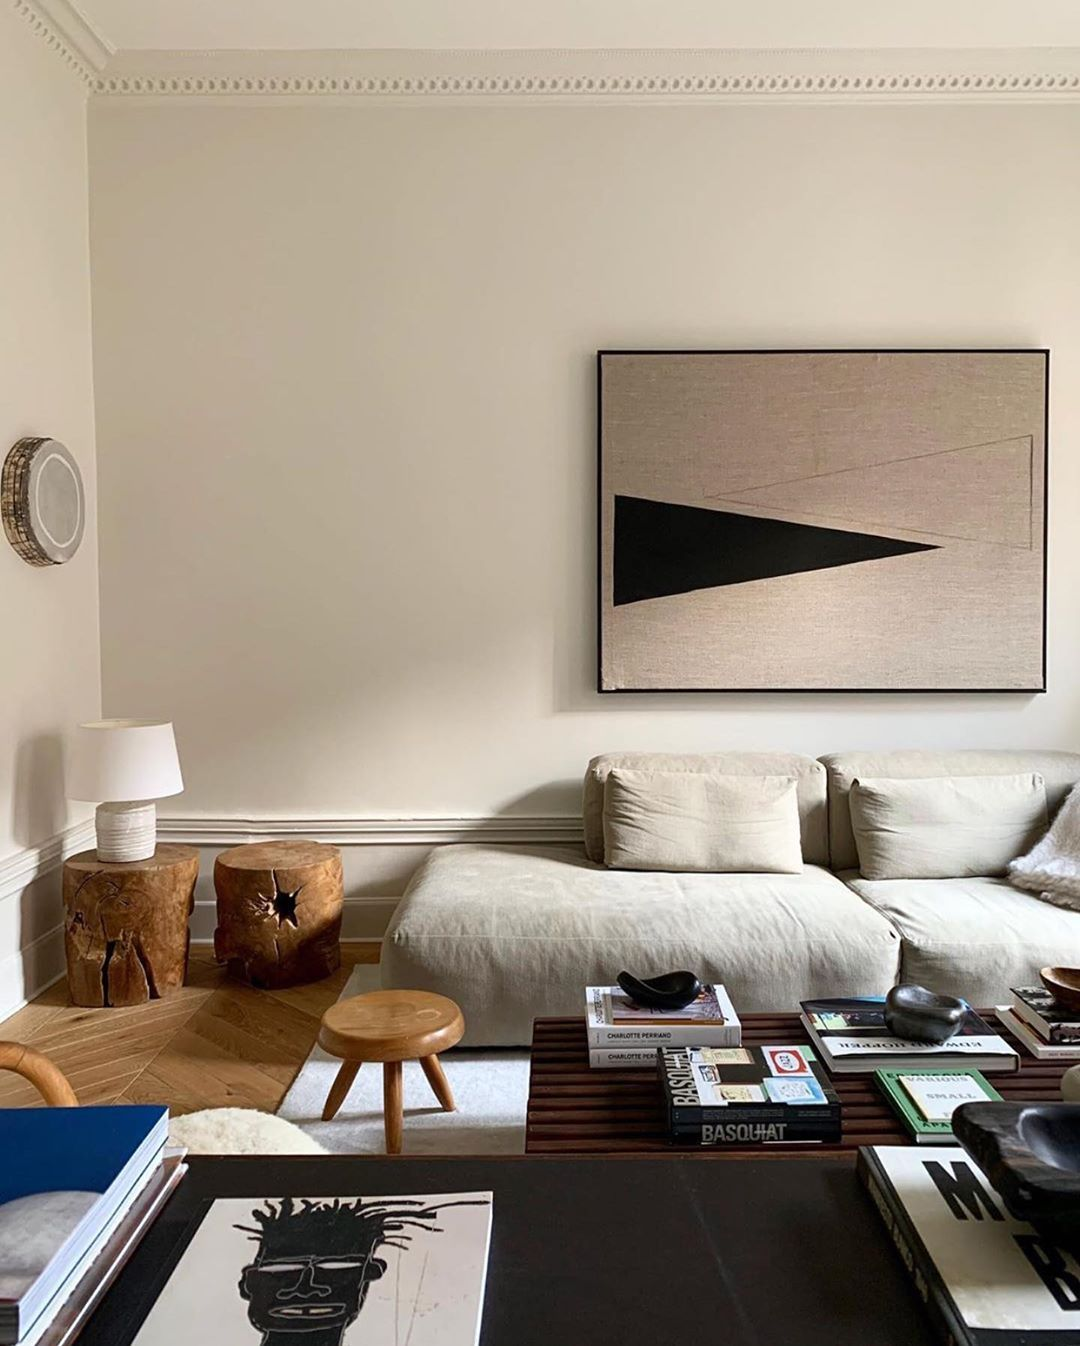 "Marc Costa on Instagram: ""#interiors #interiordesign #design #home @fredrikkarlssoninteriors #architecture #charlotteperriand #midcenturymodern #frenchmodernism…"""